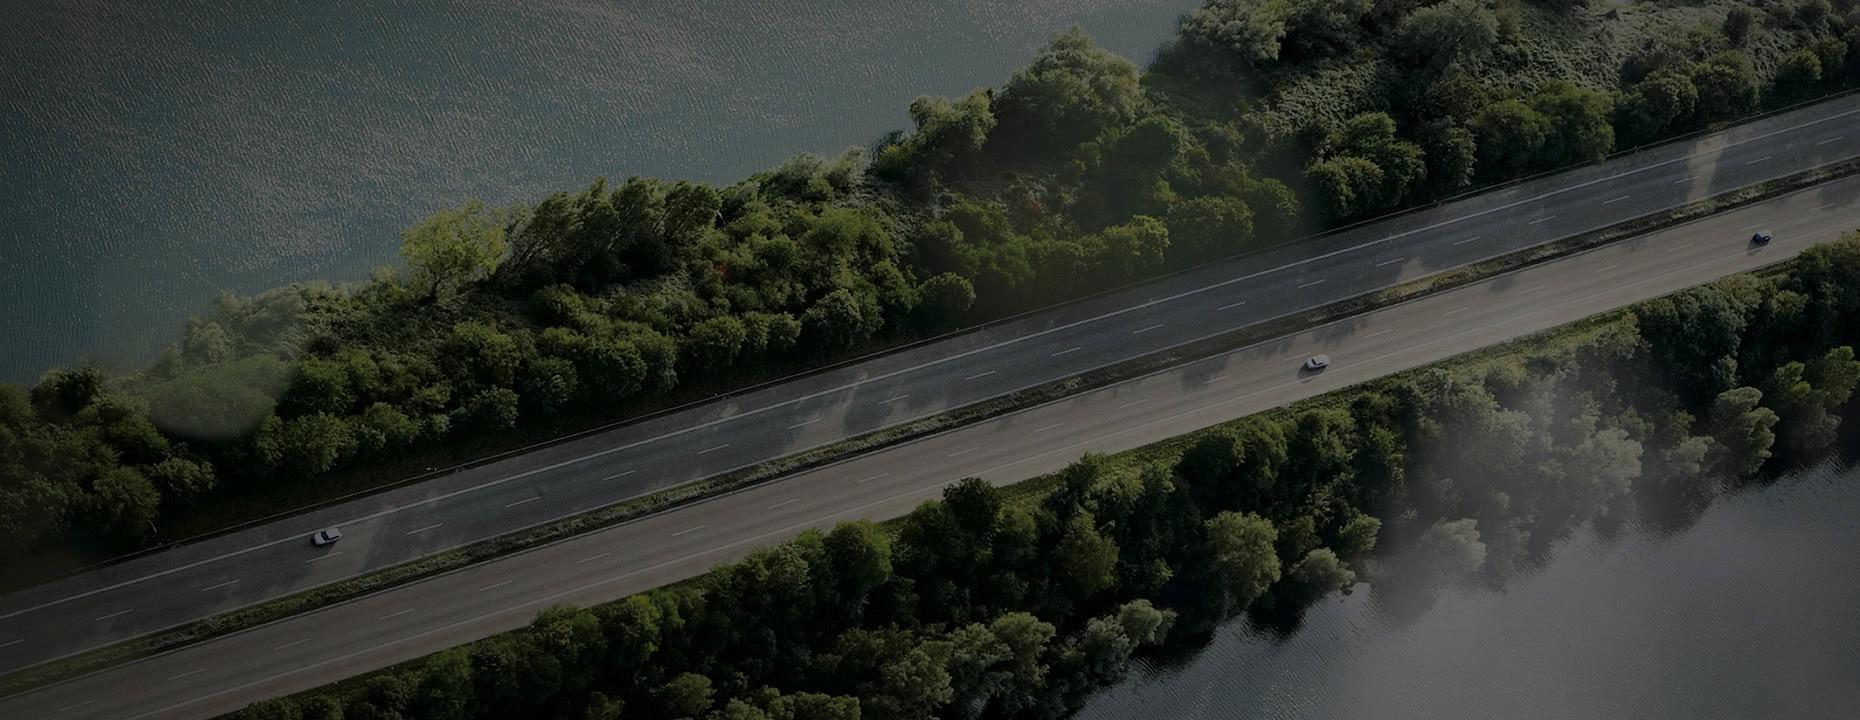 Hyundai Motor офіційно представила позашляховик Palisade | Богдан-Авто Черкаси - фото 14